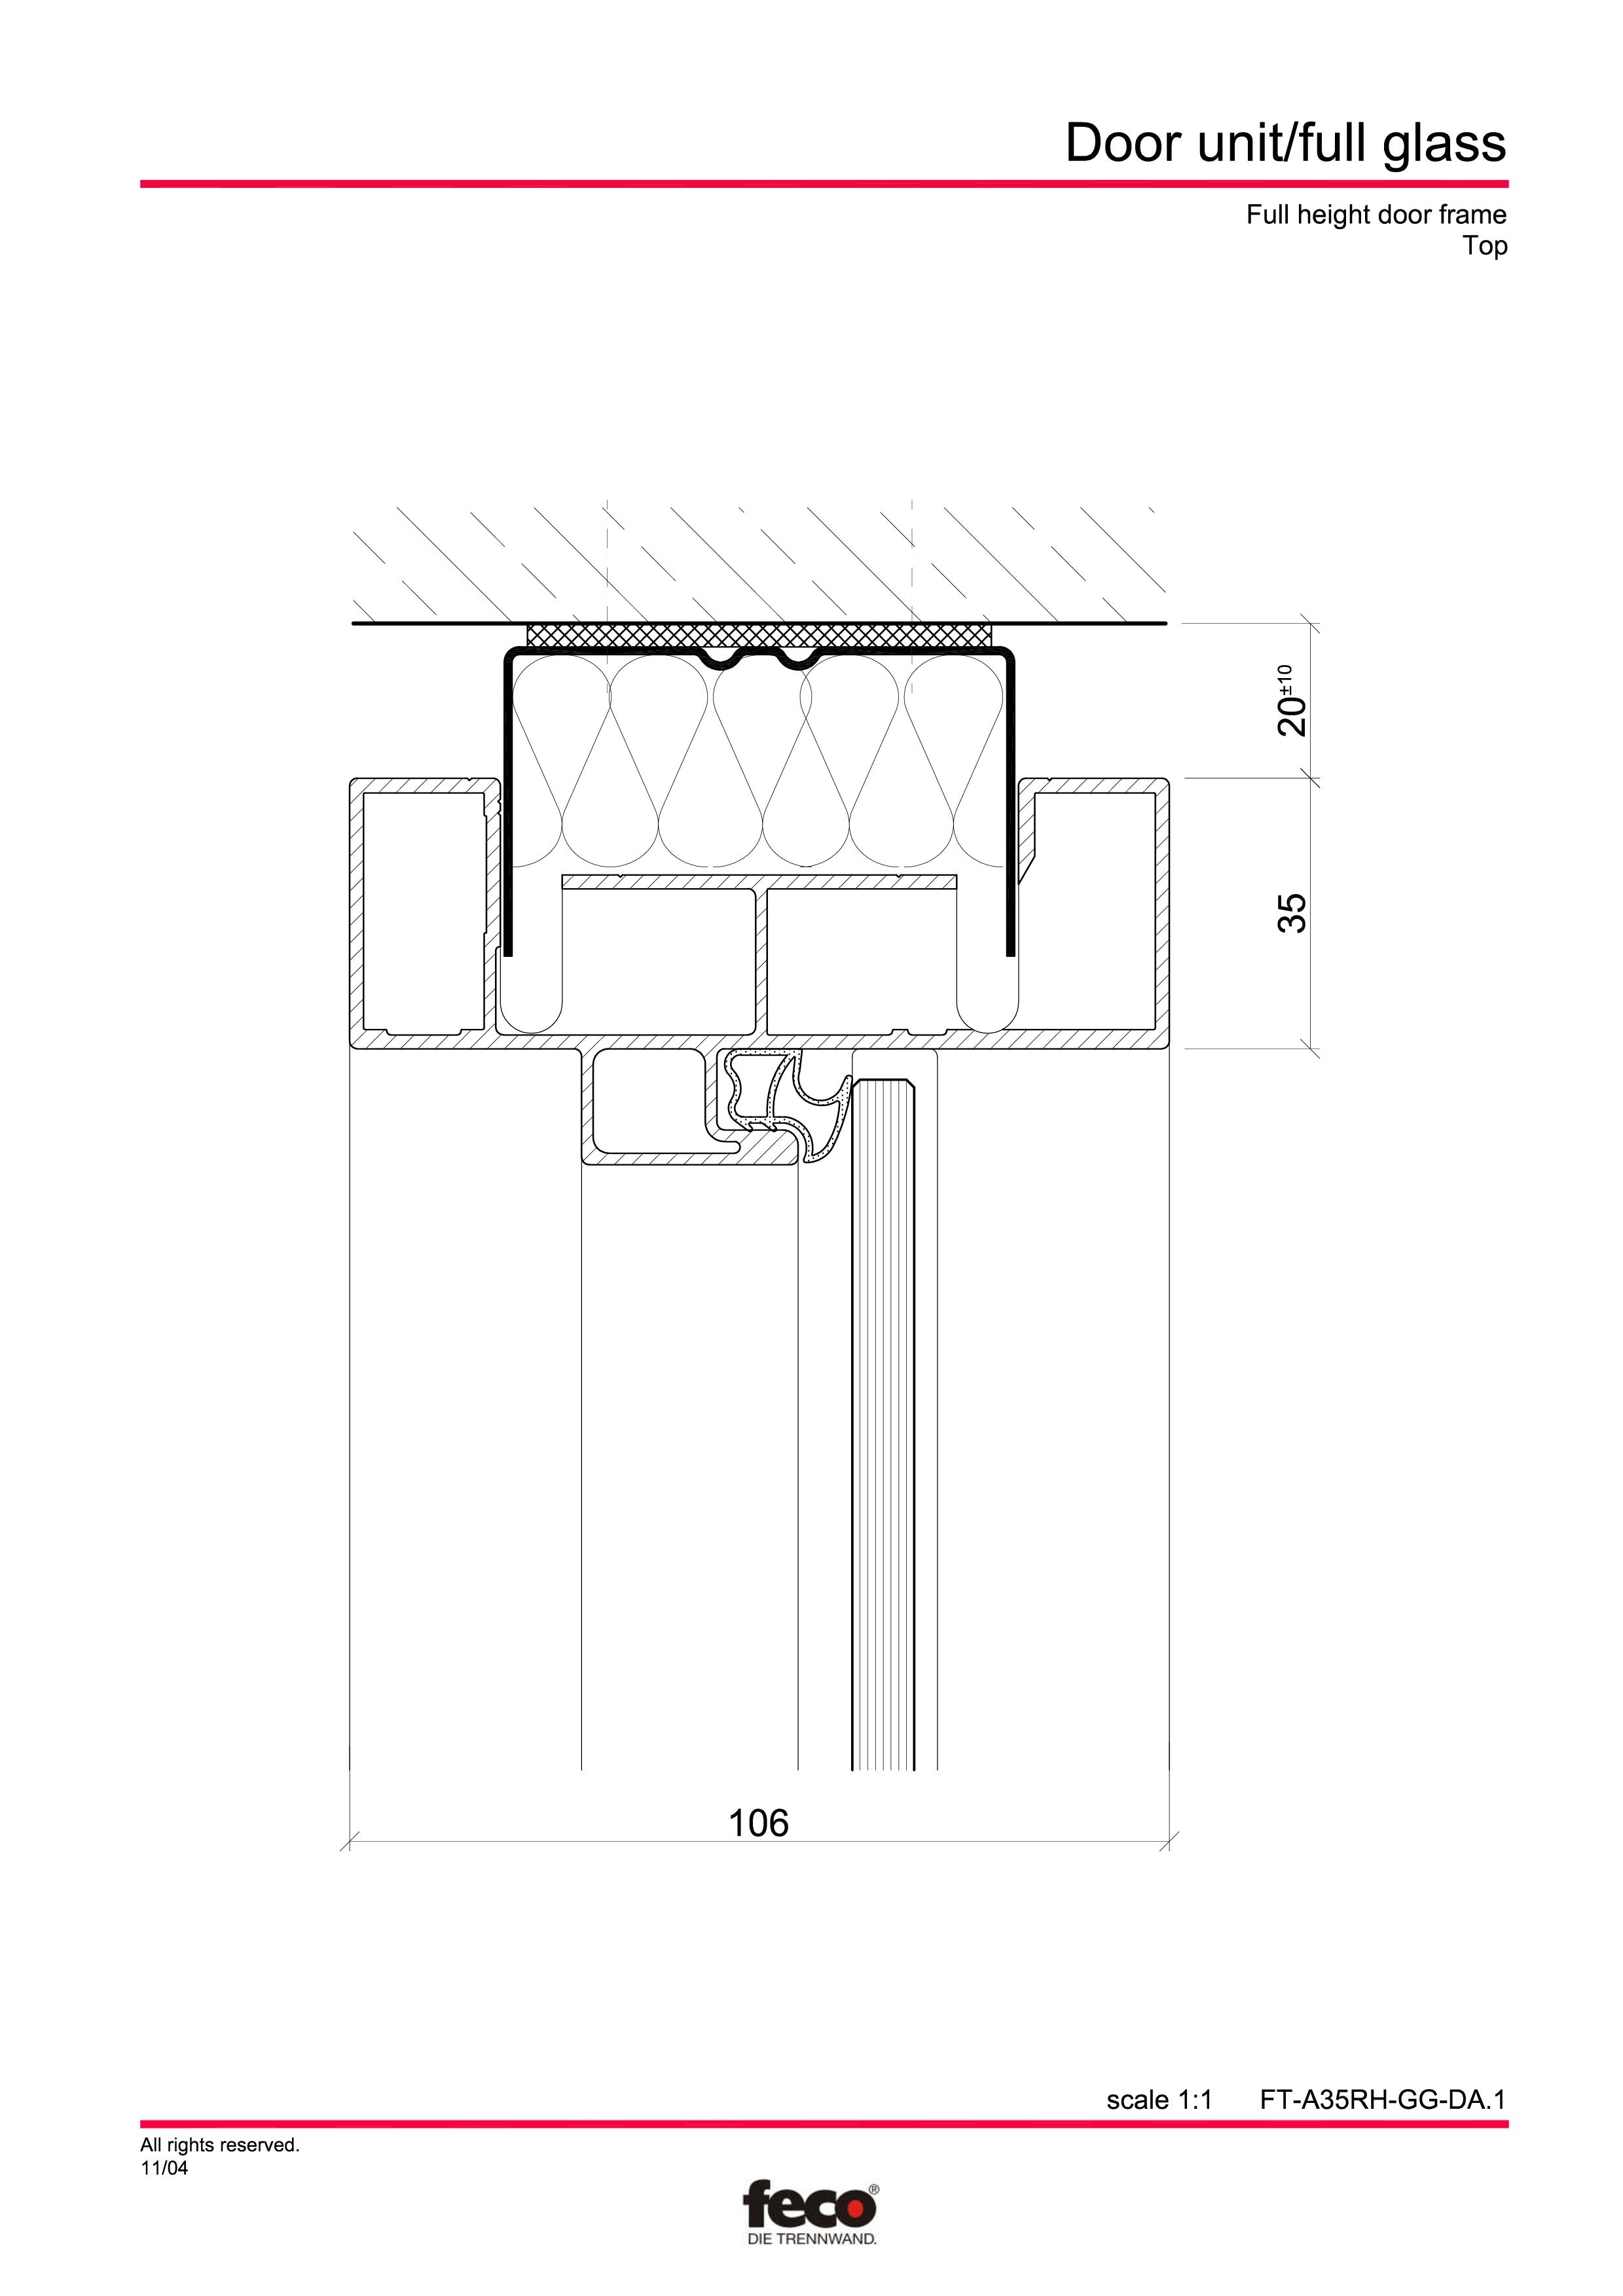 Pagina 4 - CAD-PDF Usa de sticla (pana la planseu) FECO Detaliu de montaj